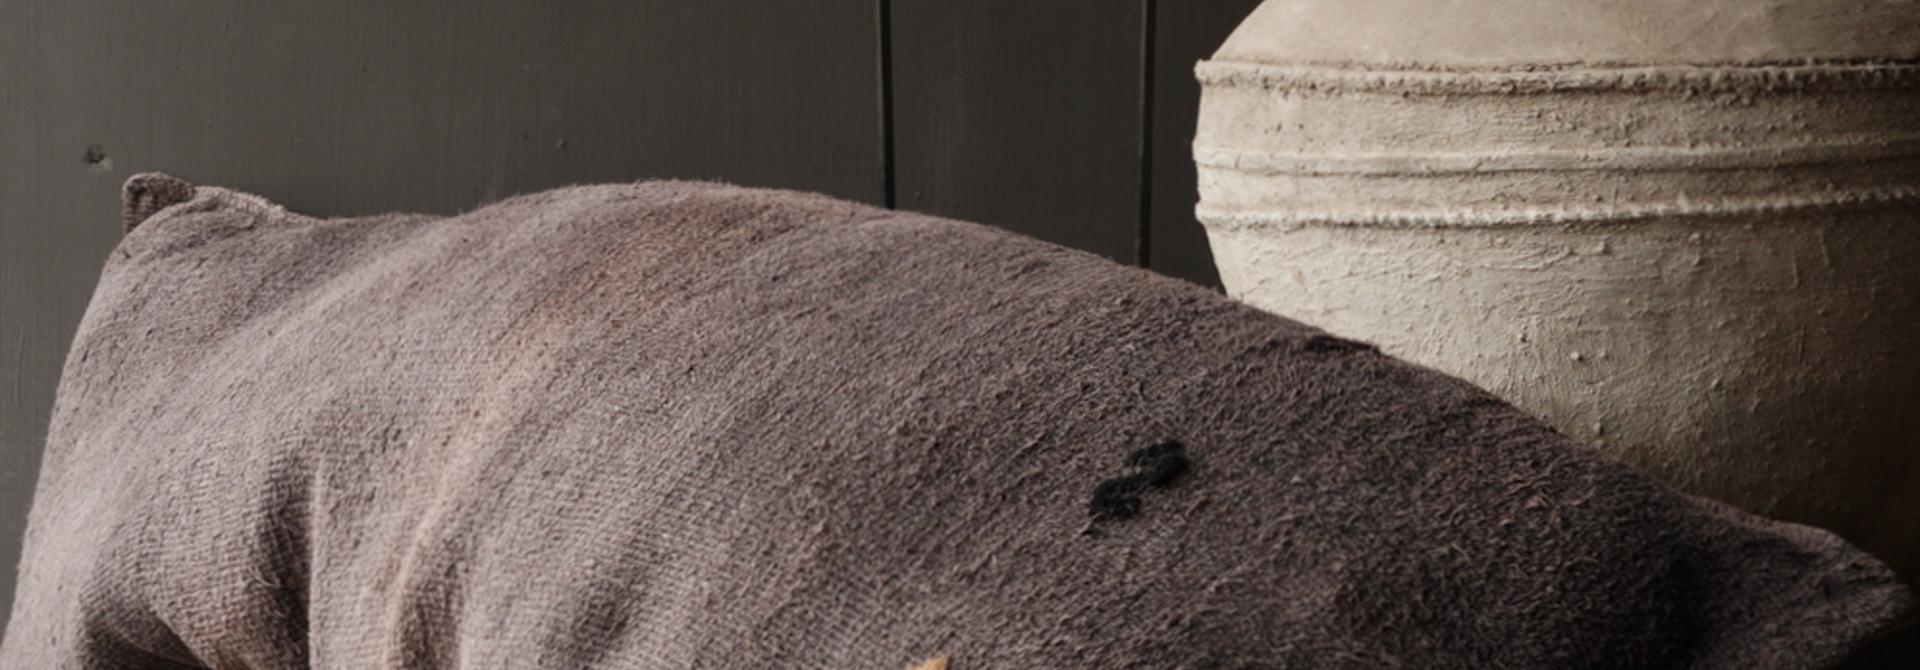 Beautiful Tough grob gewebtes Kissen (Getreidebeutel)